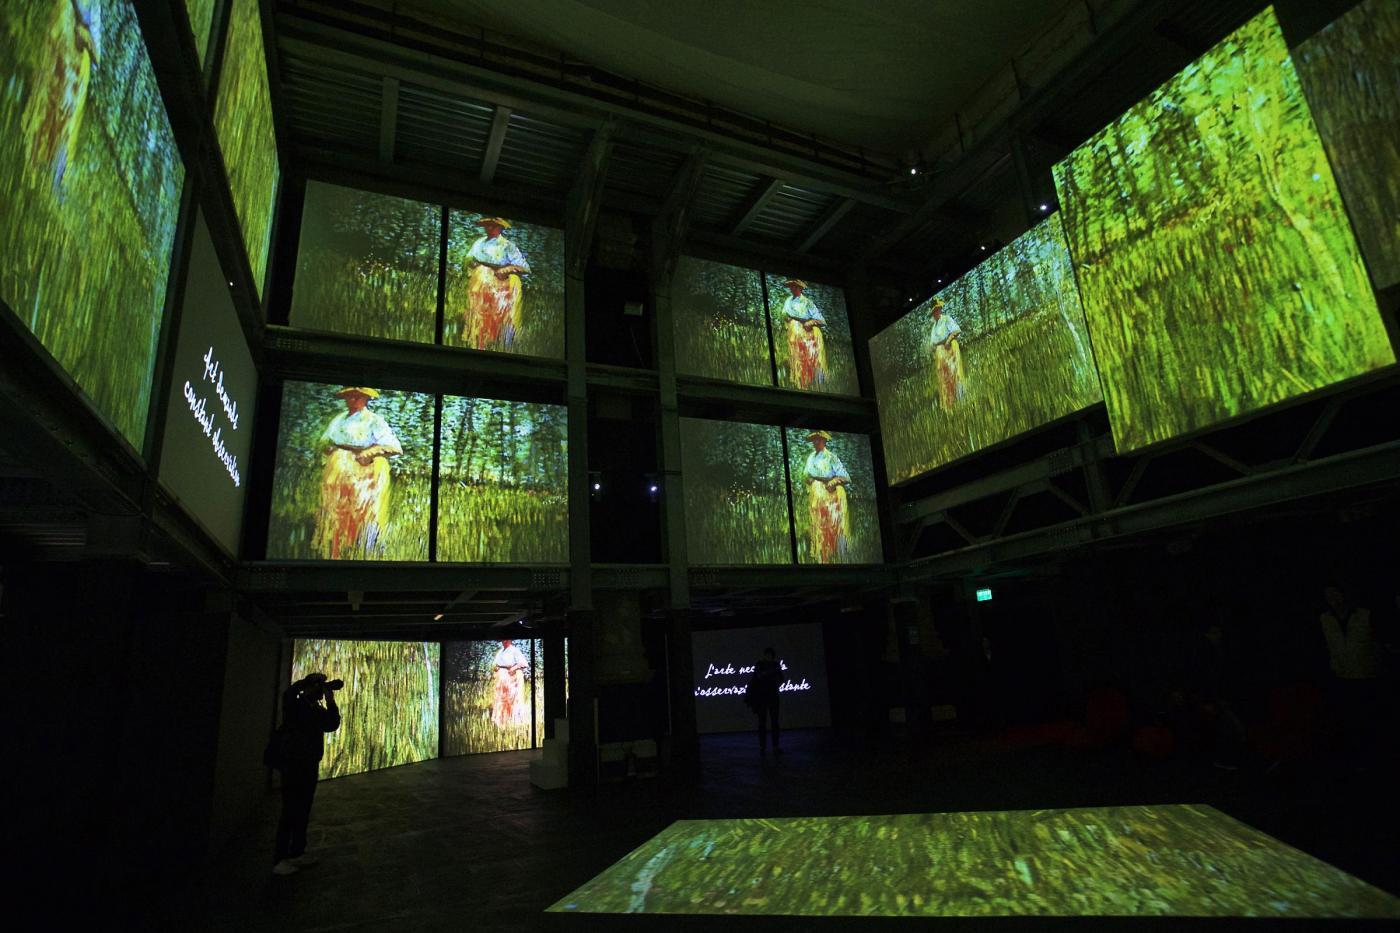 mostra itinerante Van Gogh Alive 2017